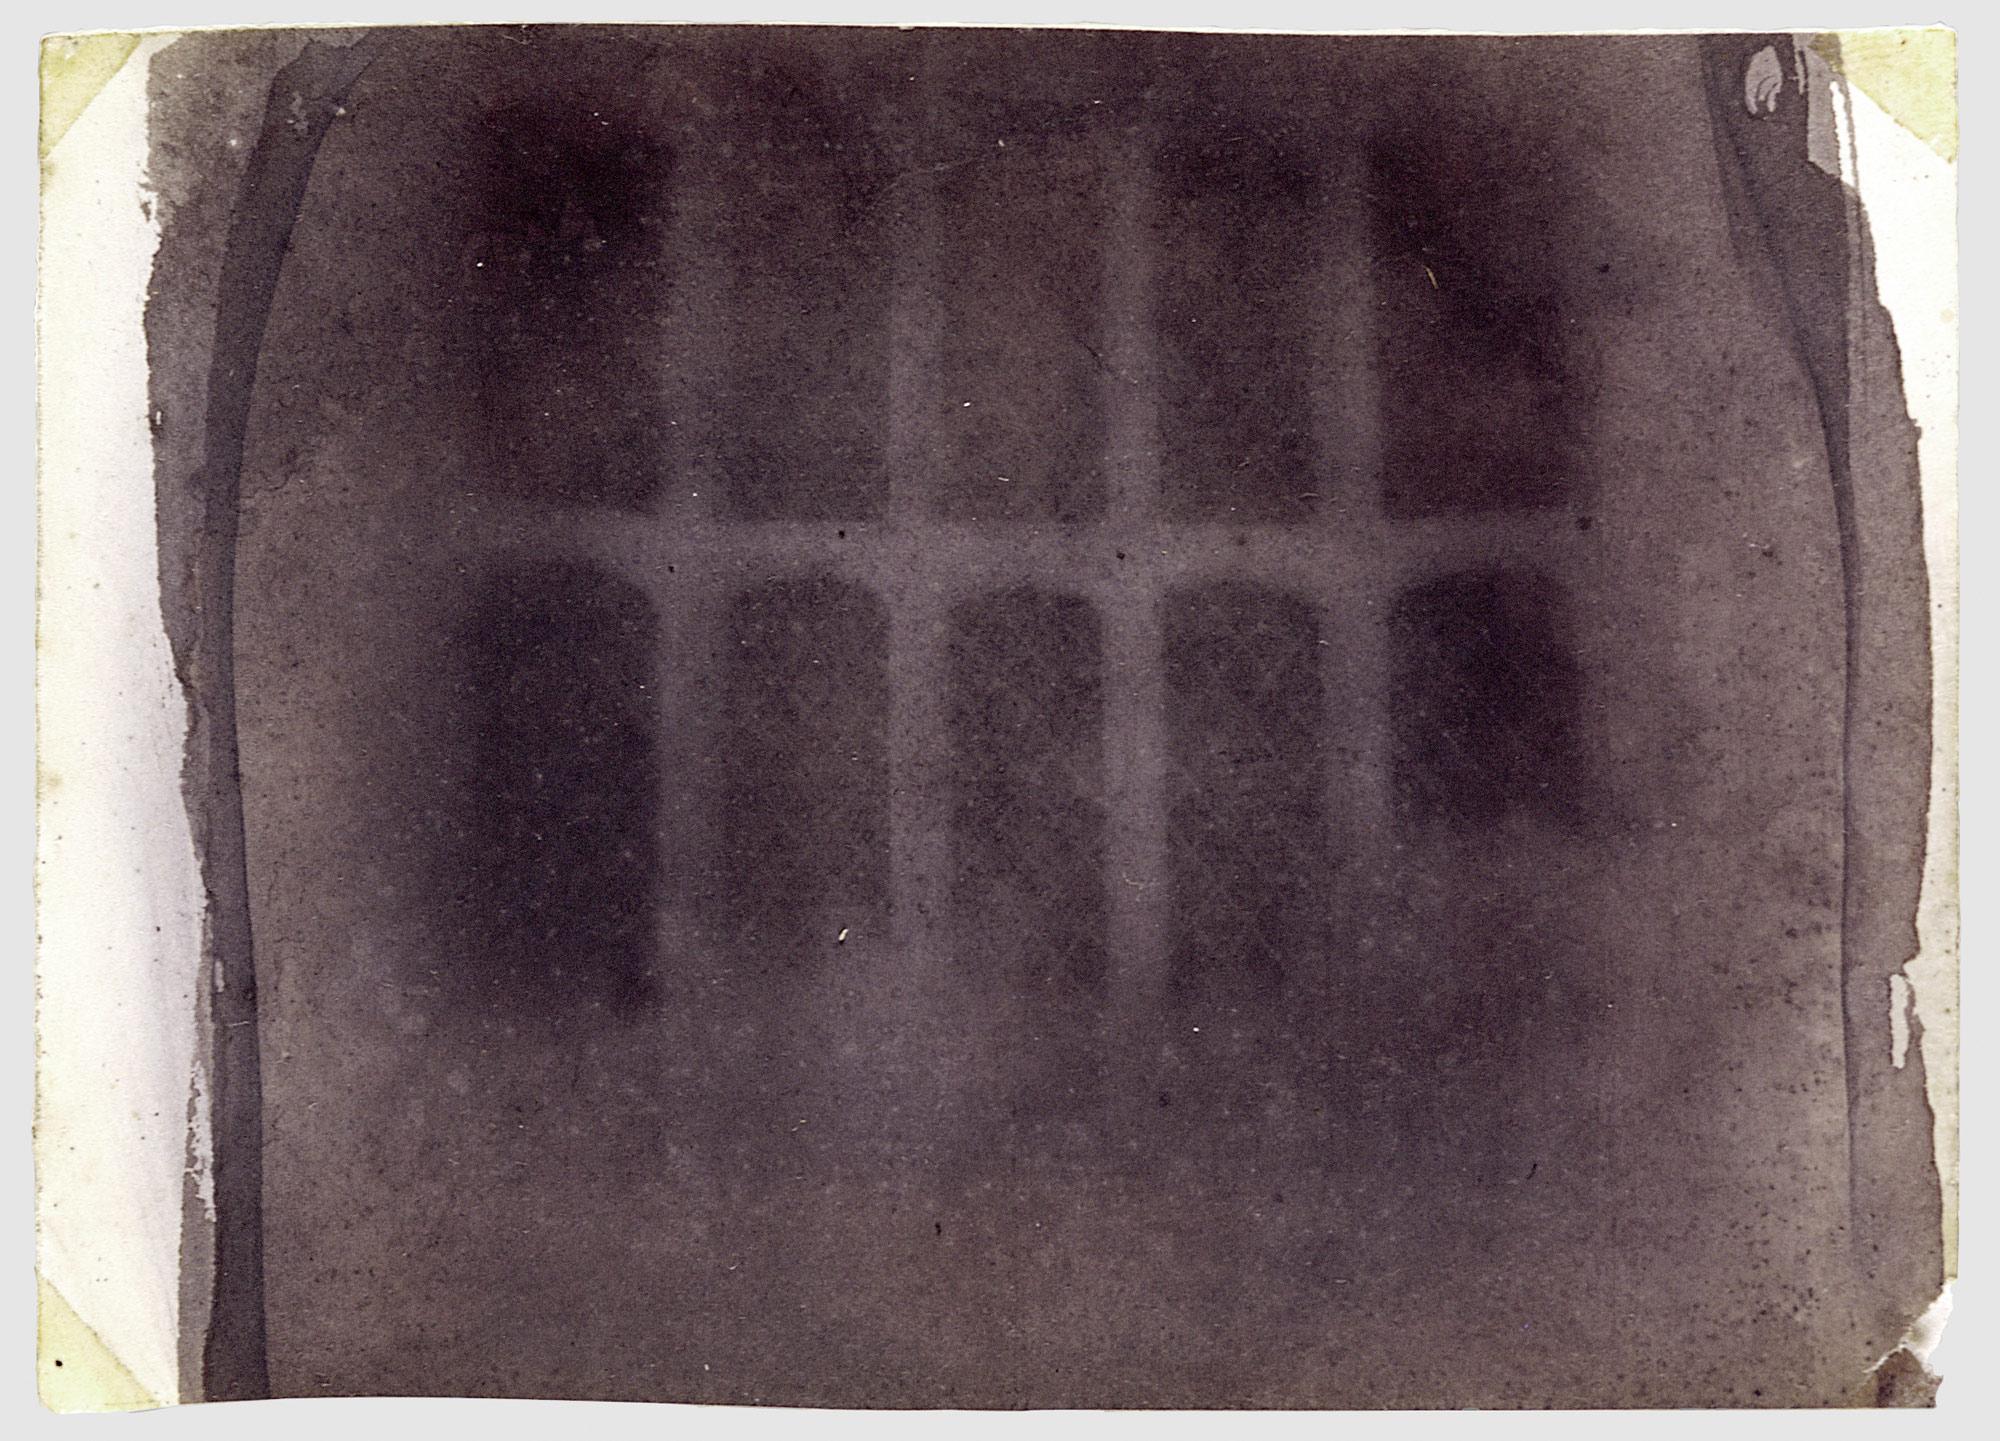 Oriel Window by William Henry Fox Talbot